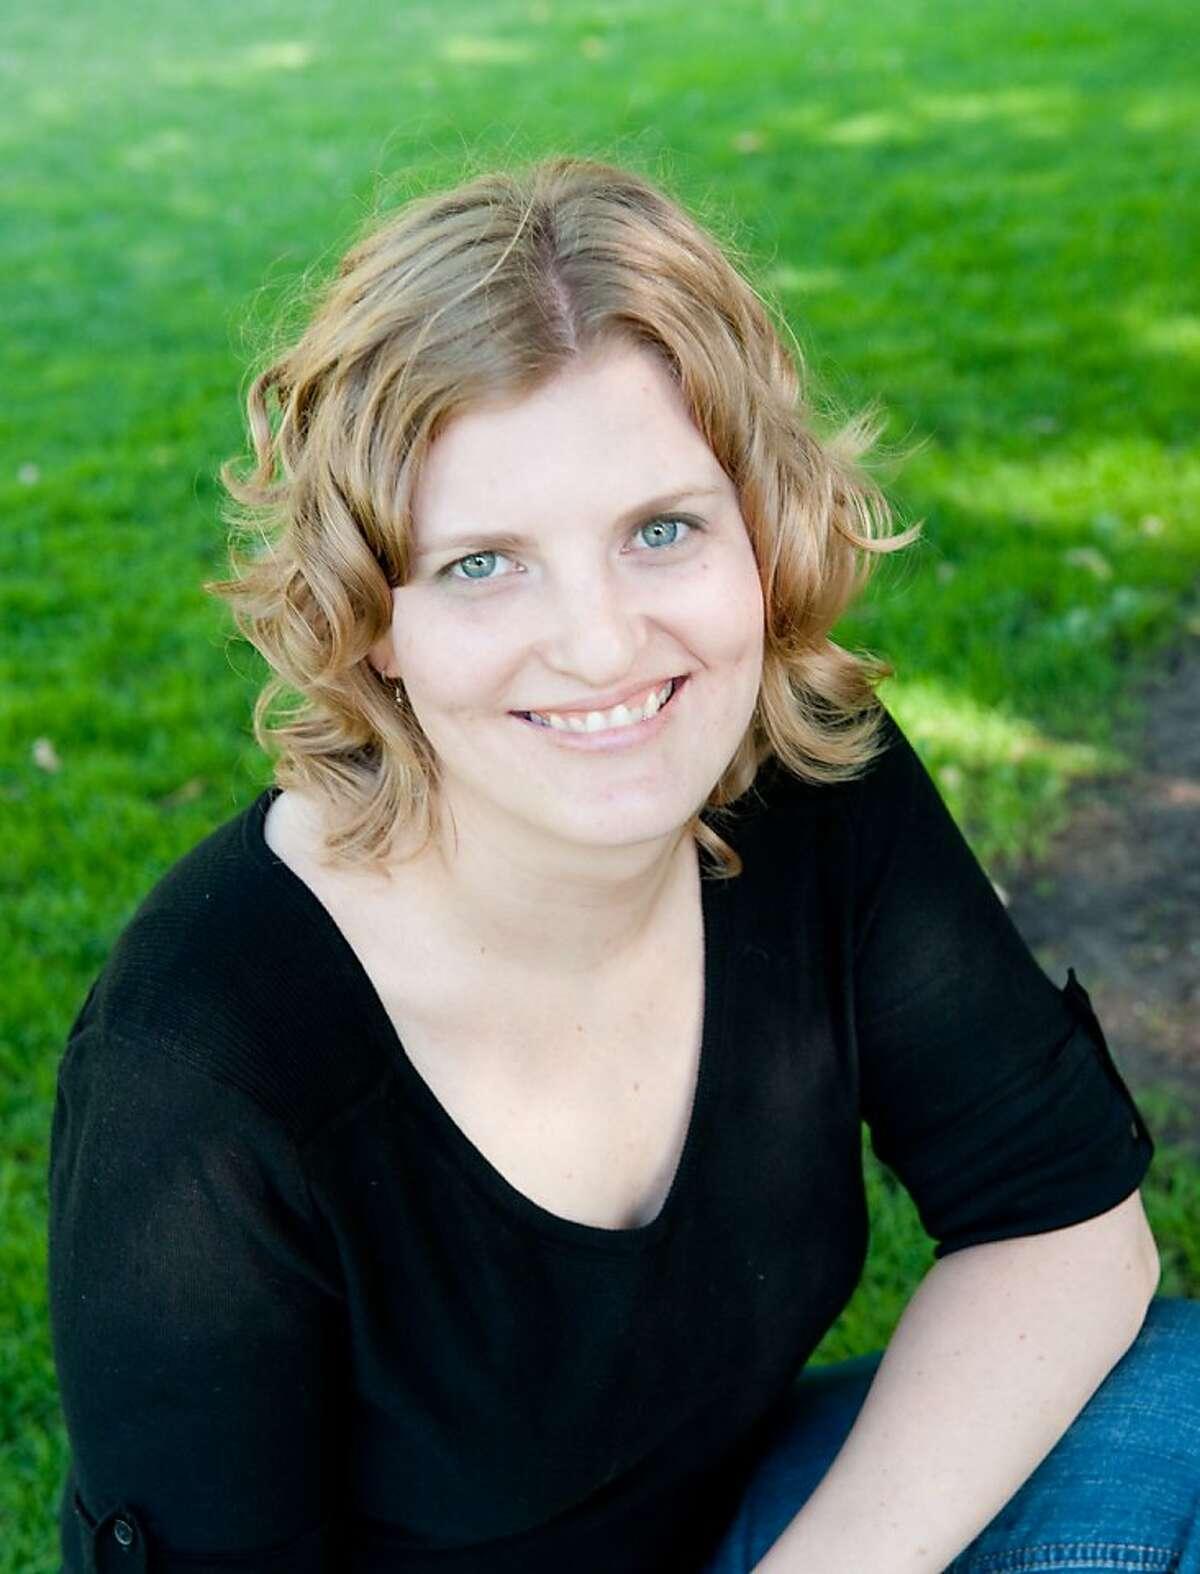 Melanie Thorne